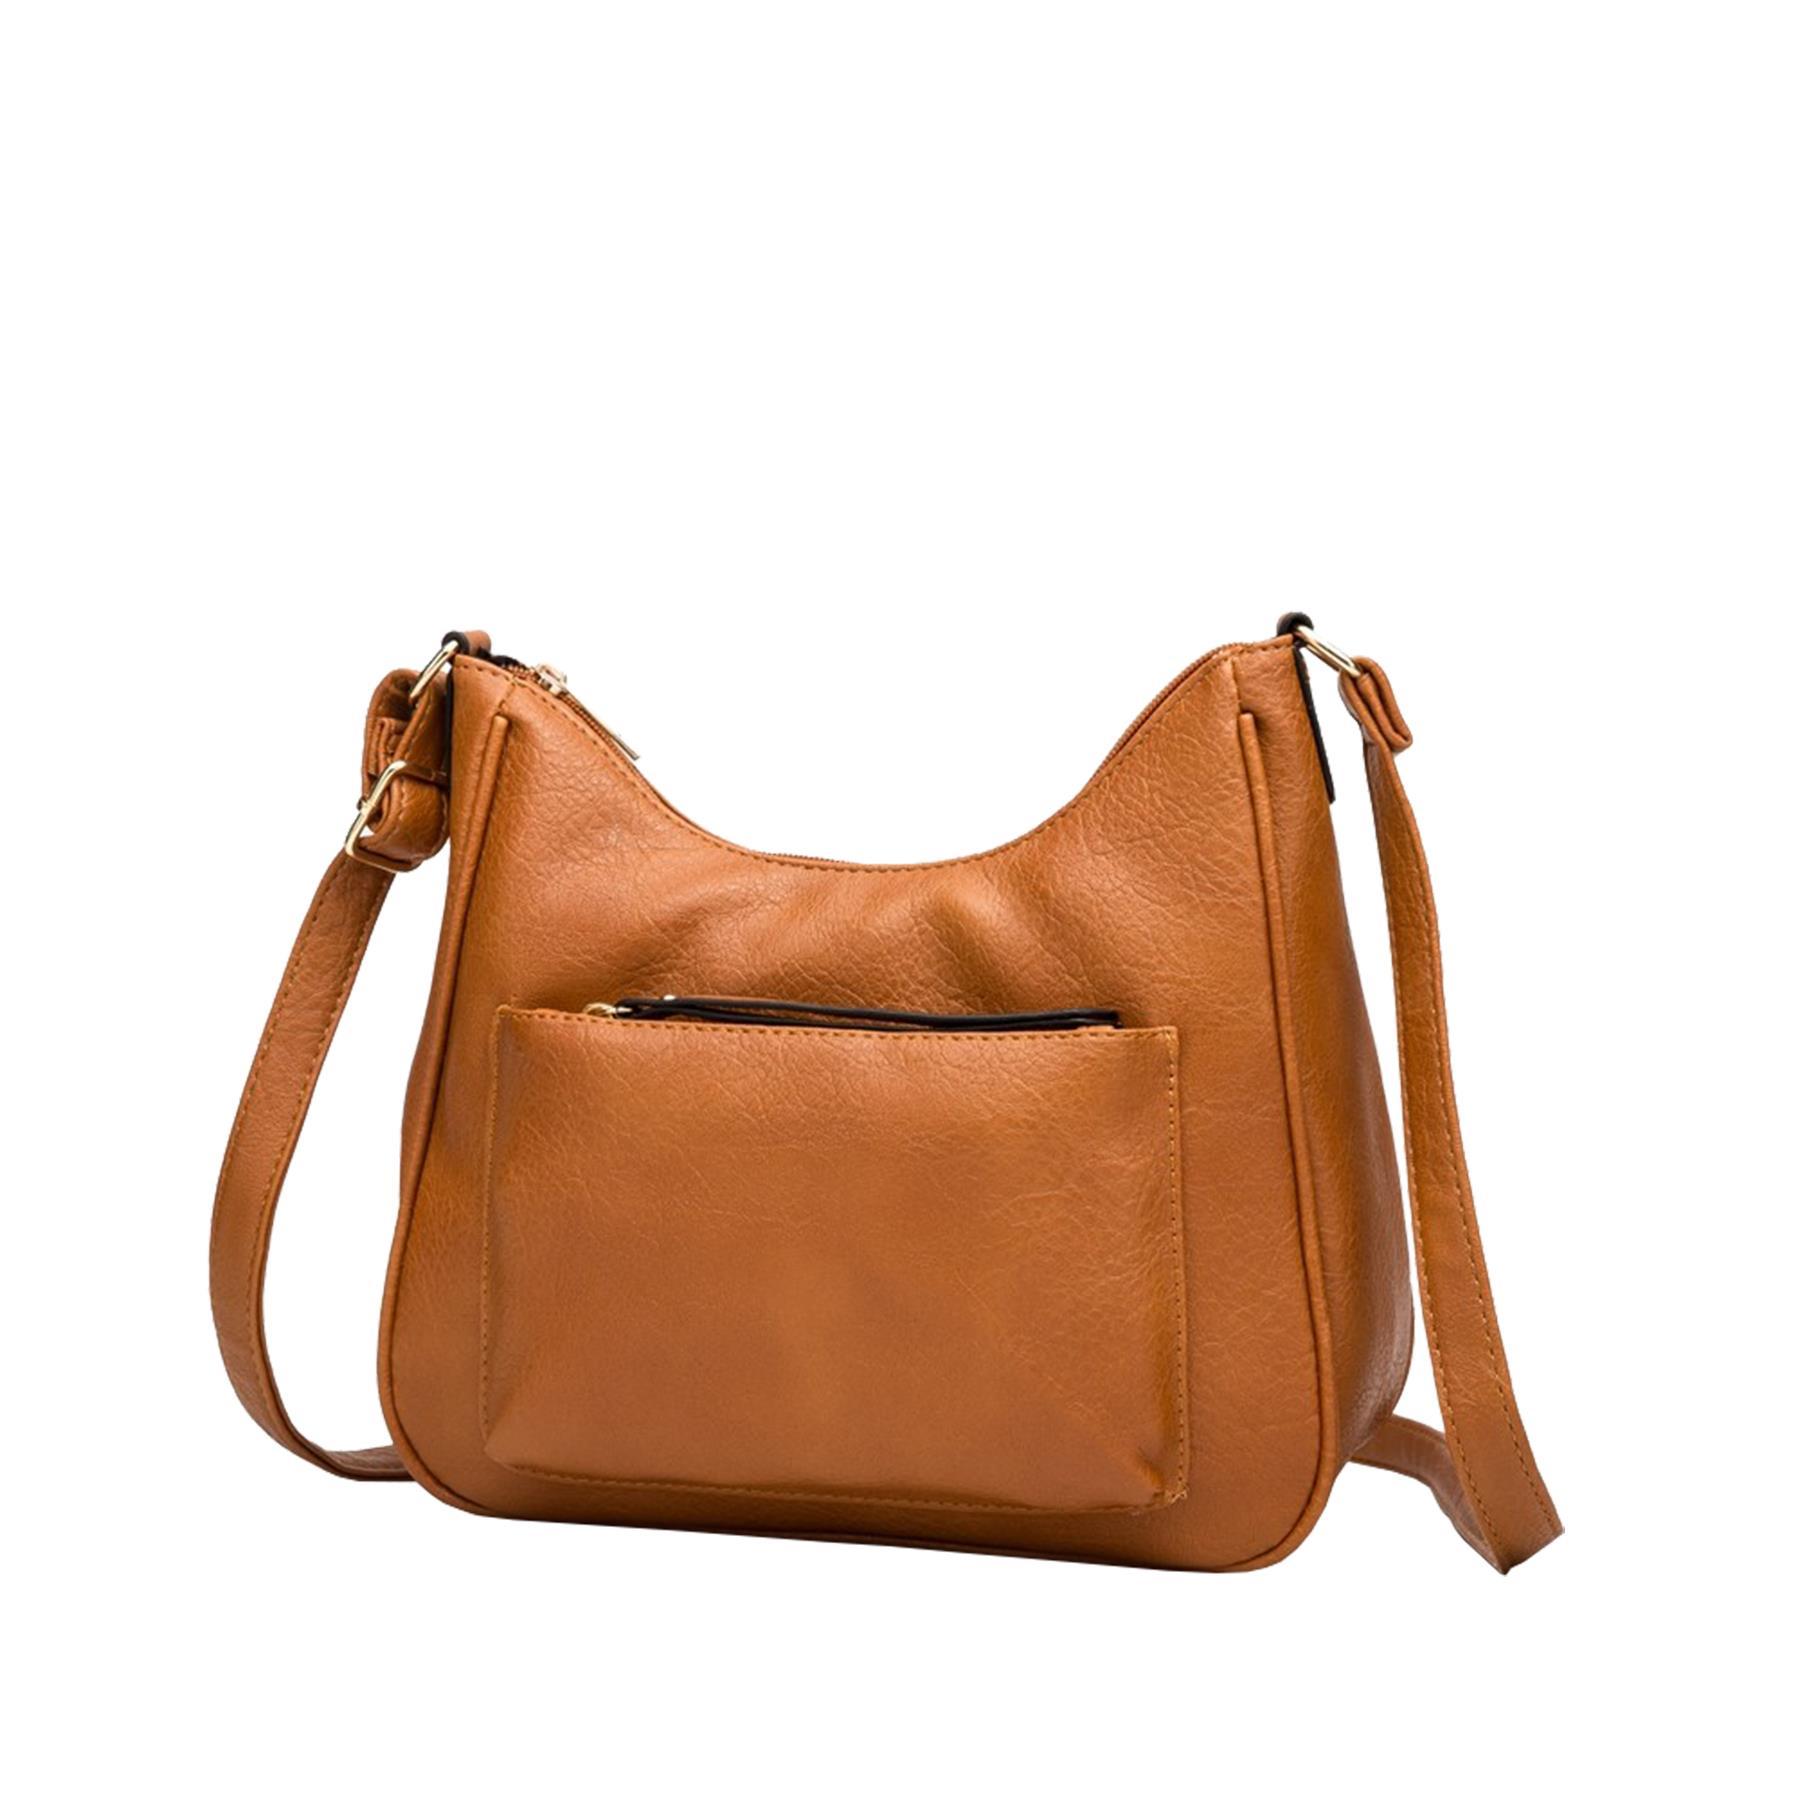 New-Soft-Synthetic-Leather-Front-Pocket-Ladies-Casual-Crossbody-Bag-Handbag thumbnail 15